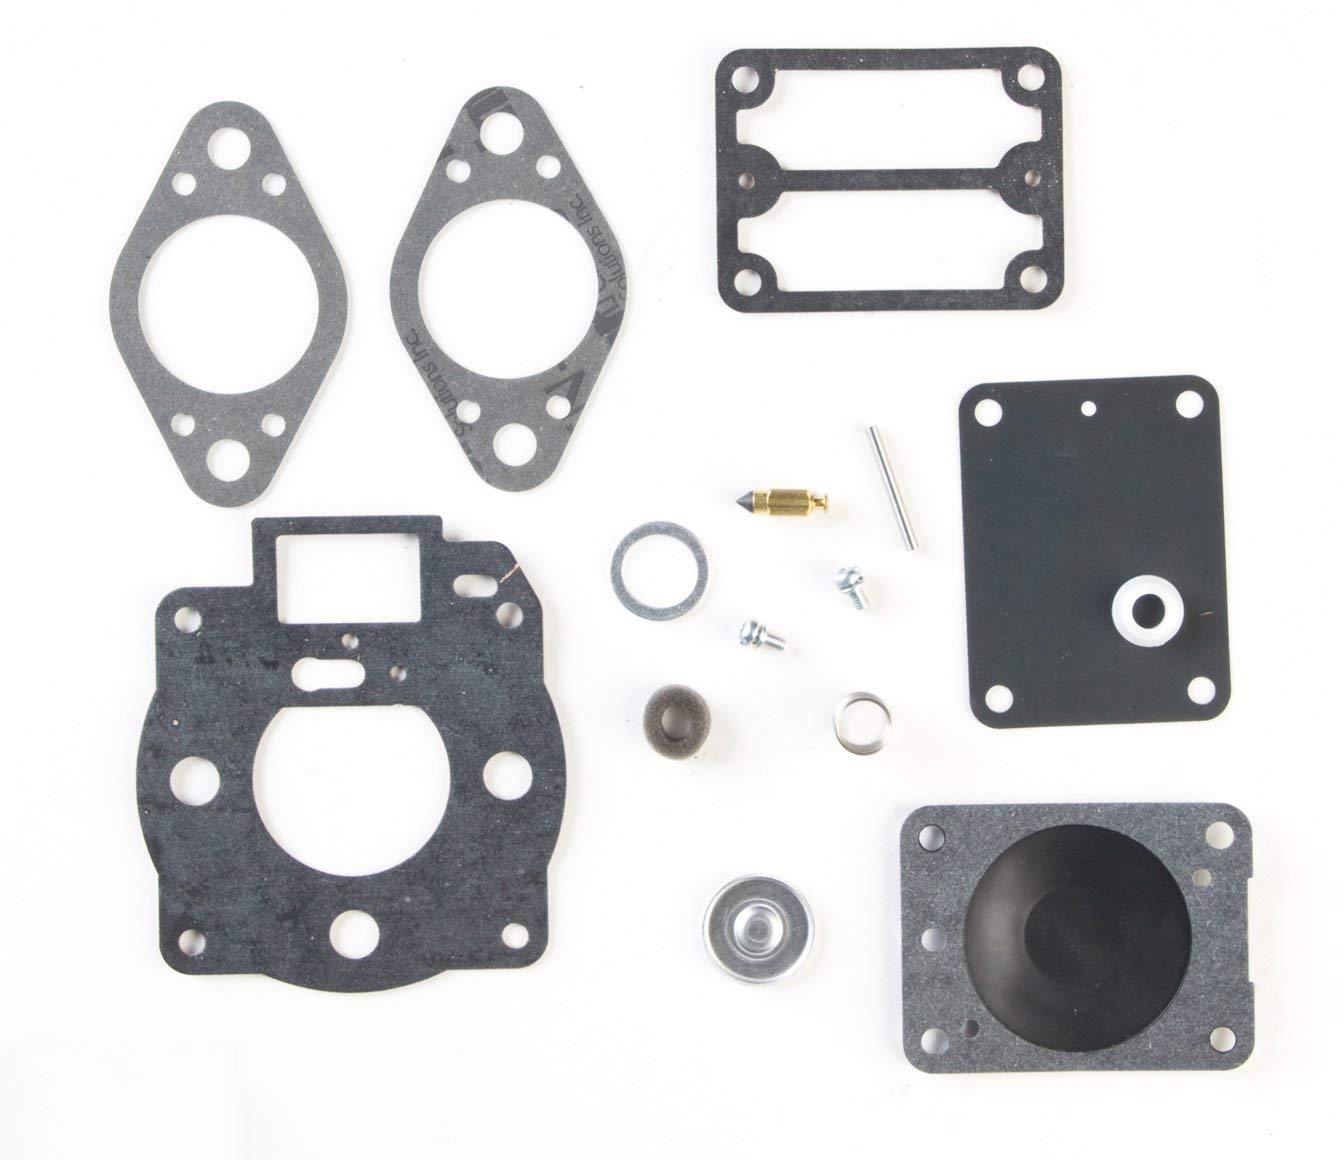 Briggs & Stratton 693501 Carburetor Overhaul Kit Replacement Part